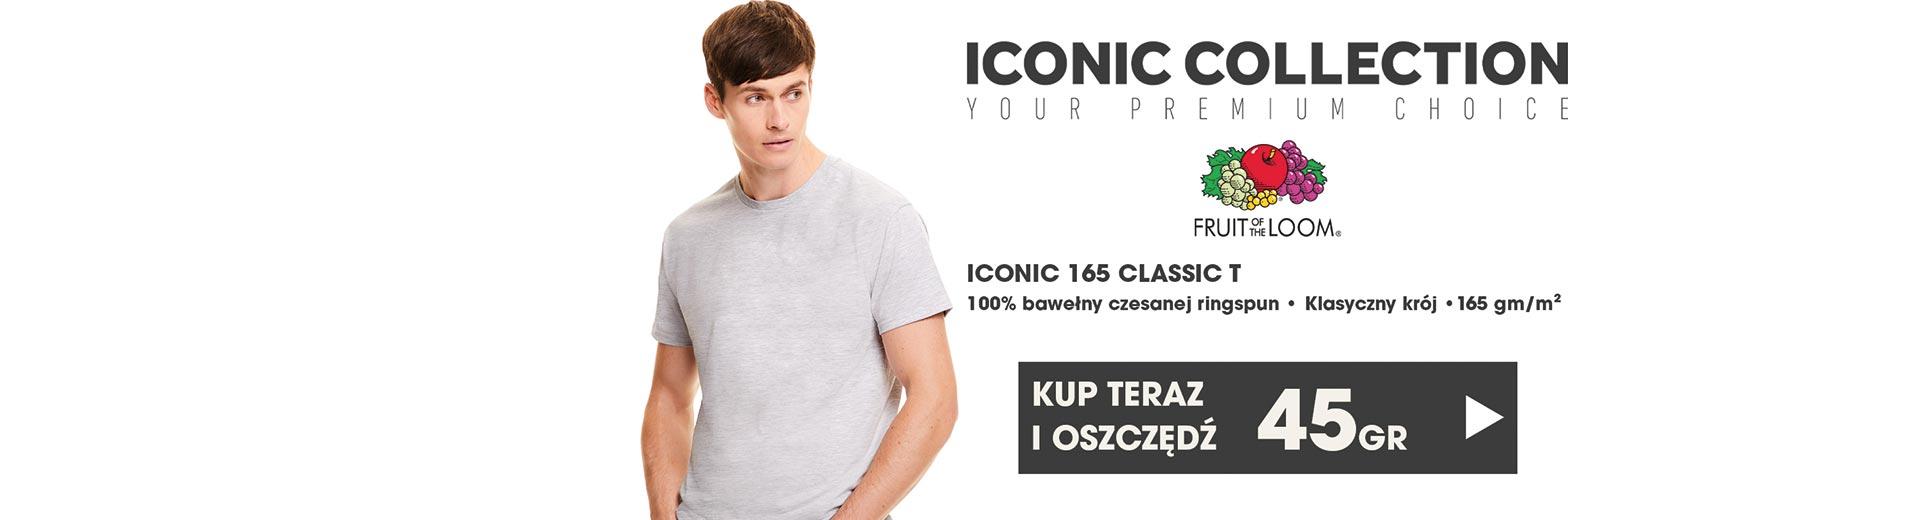 Iconic - 10cent